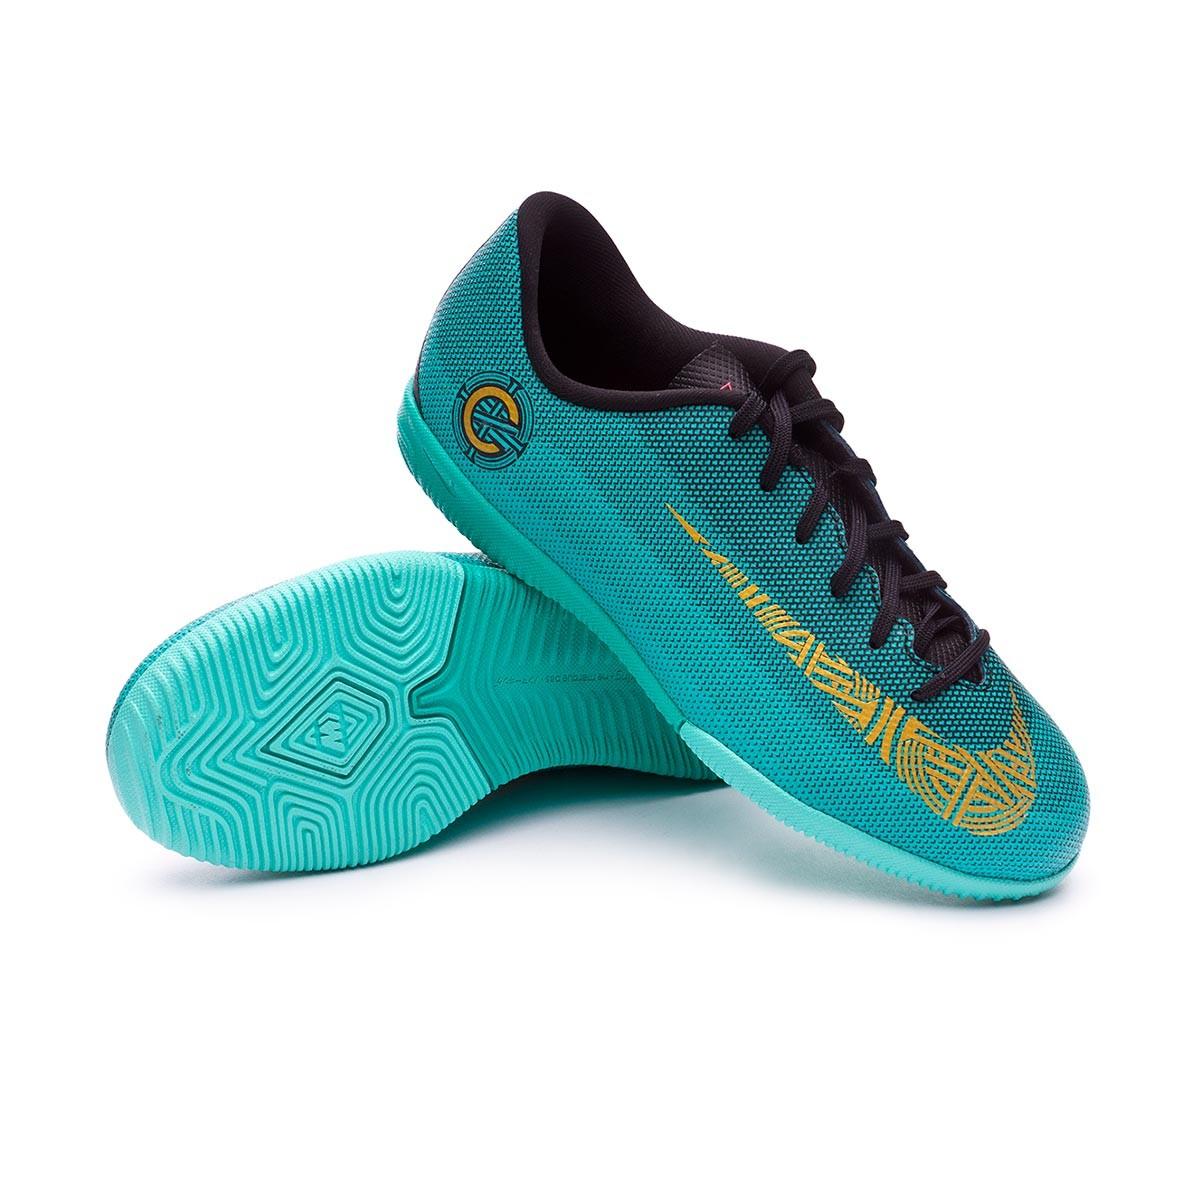 ... Zapatilla Mercurial VaporX XII Academy GS CR7 IC Niño Clear  jade-Metallic vivid gold-. CATEGORY. Futsal ddf19ae67aa34